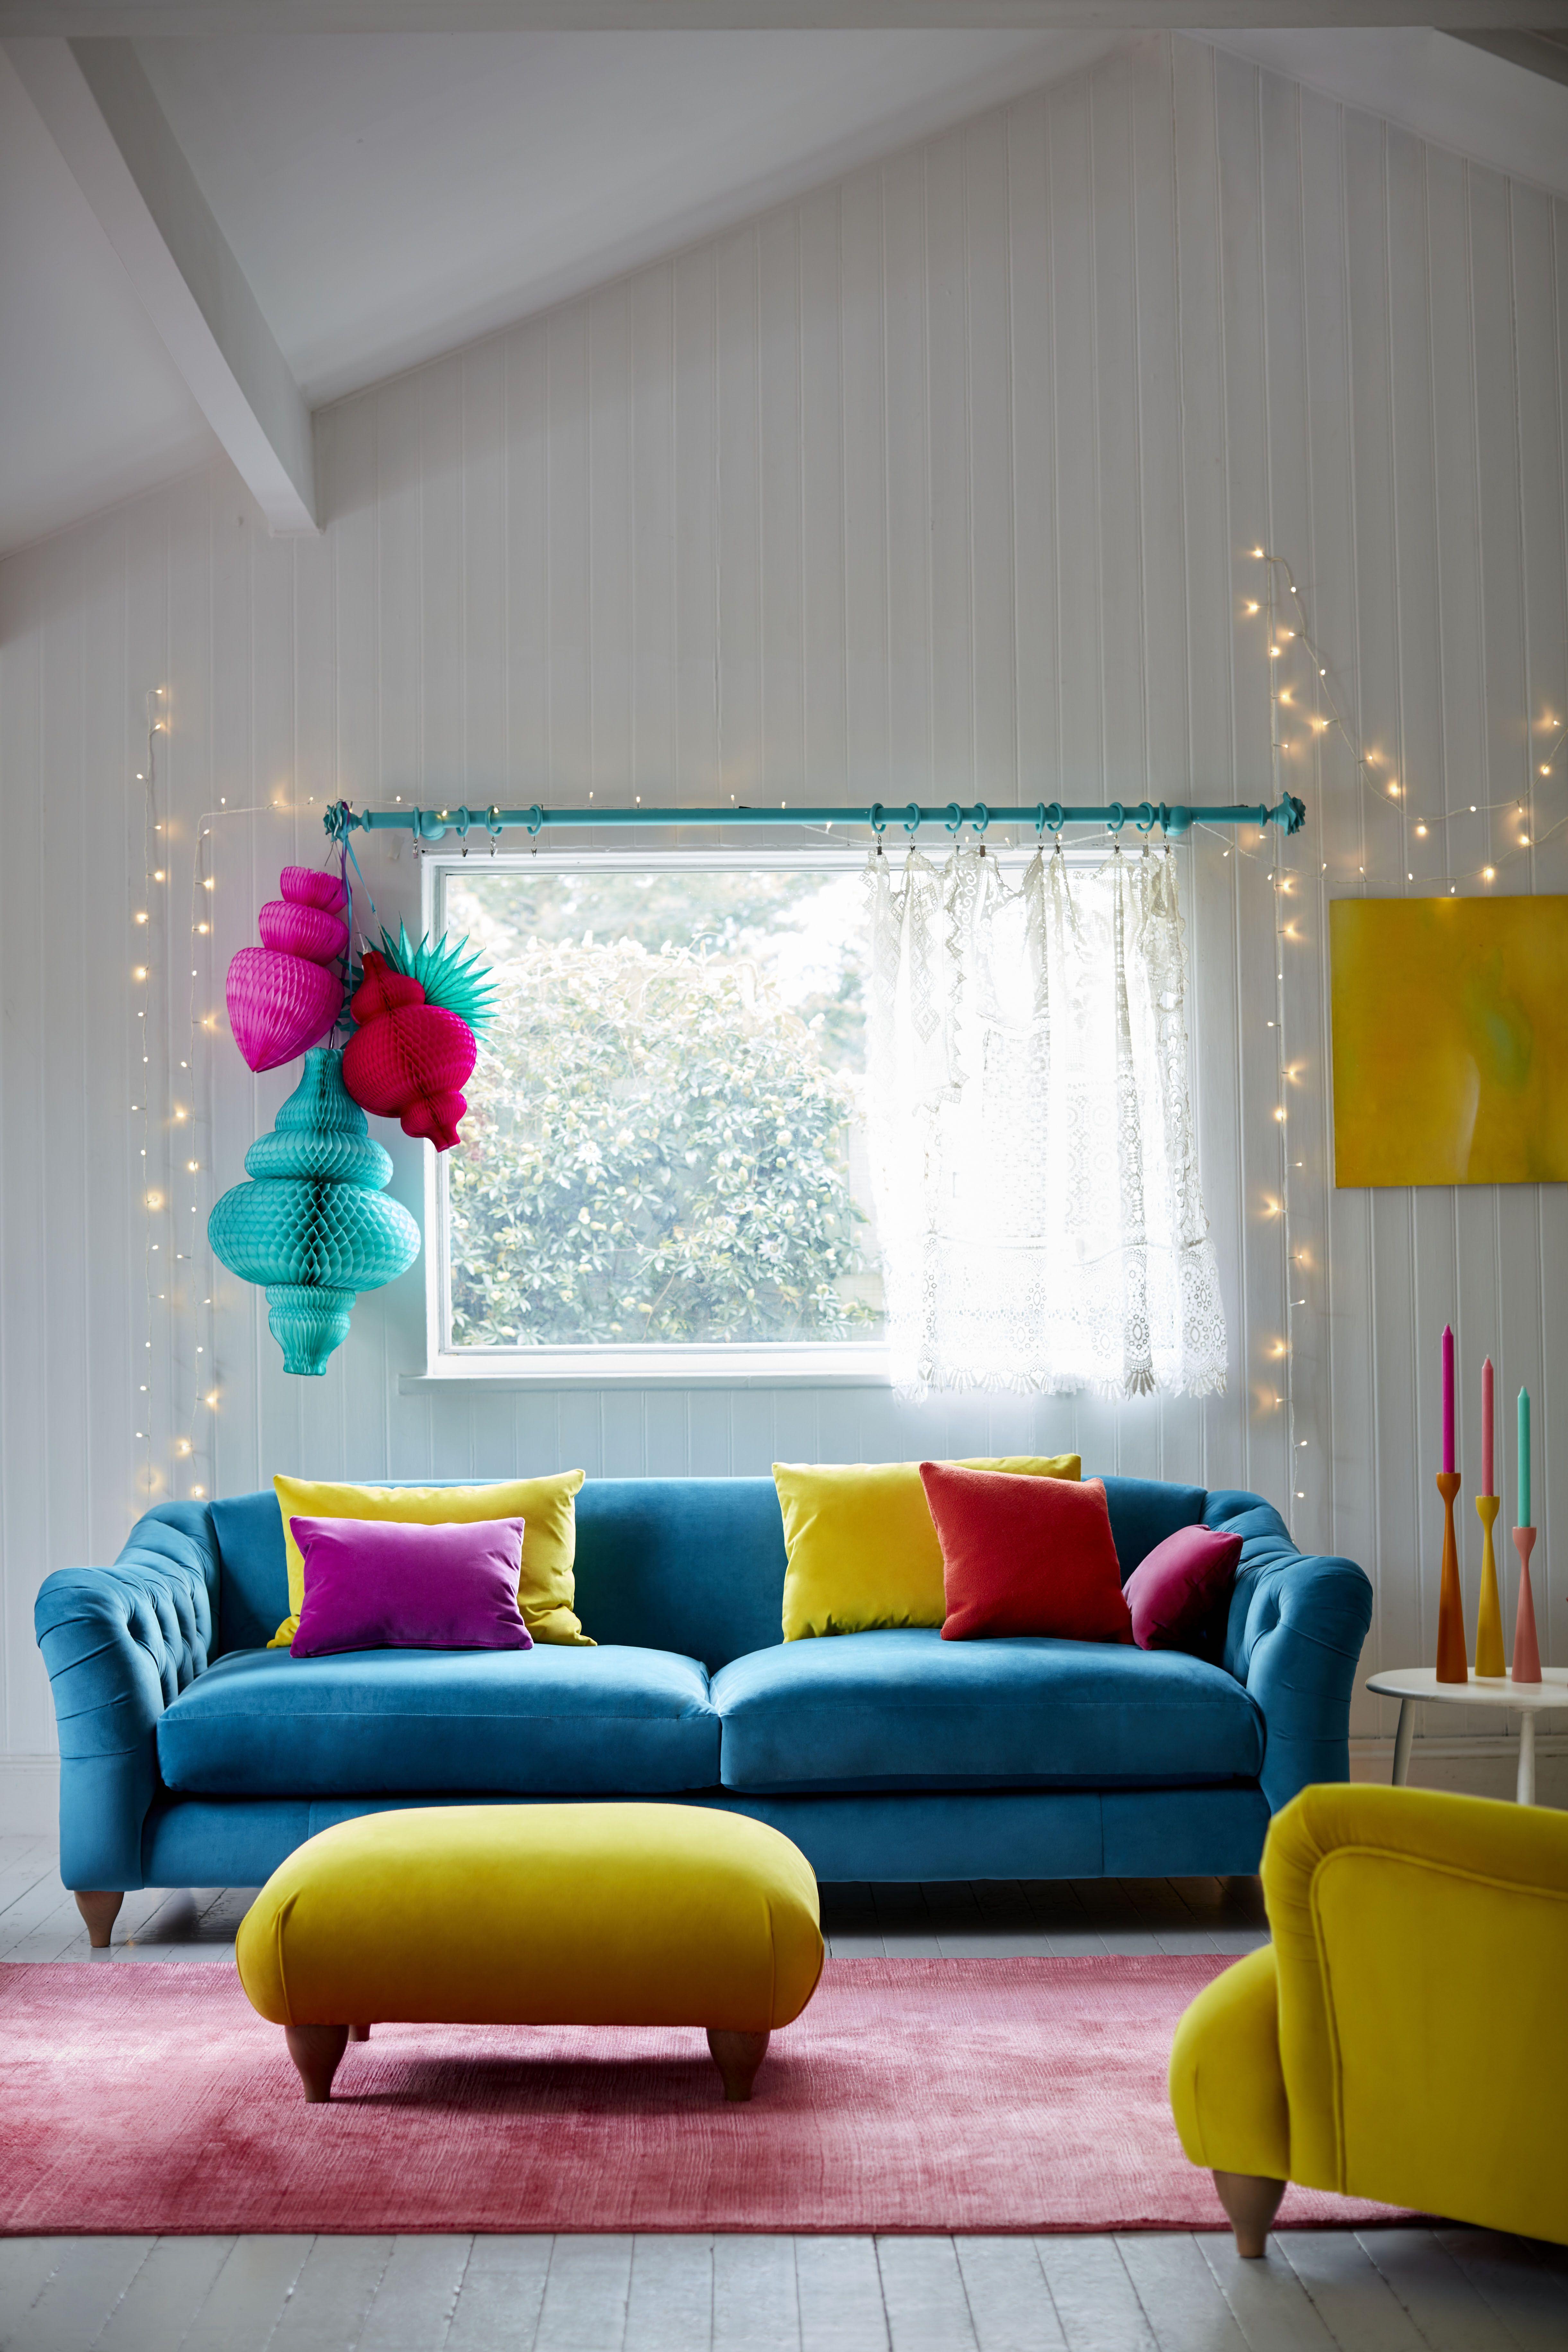 Raffles 4 Seater Sofa Classic Velvet Colourful Living Room Chesterfield Style Sofa Classic Sofa